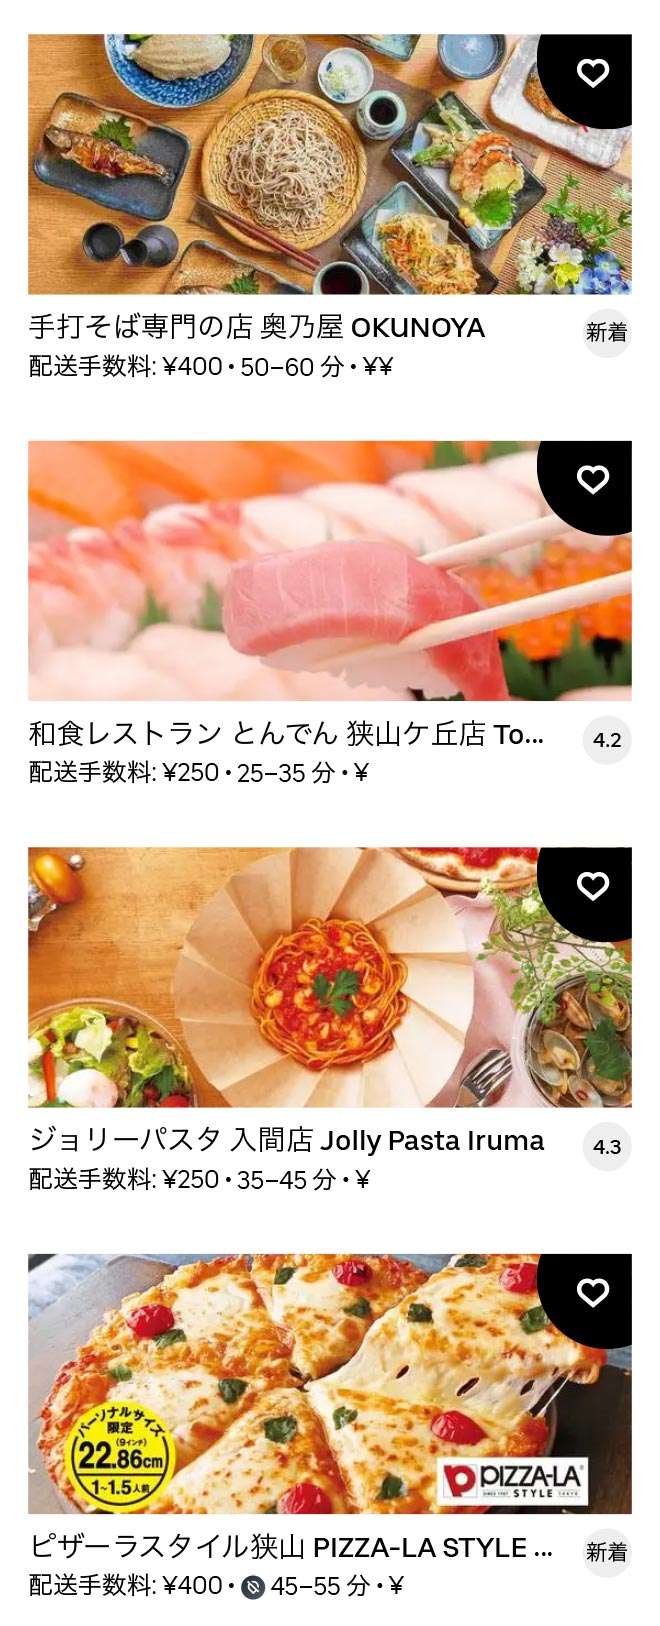 Musashi fujisawa menu 2101 10